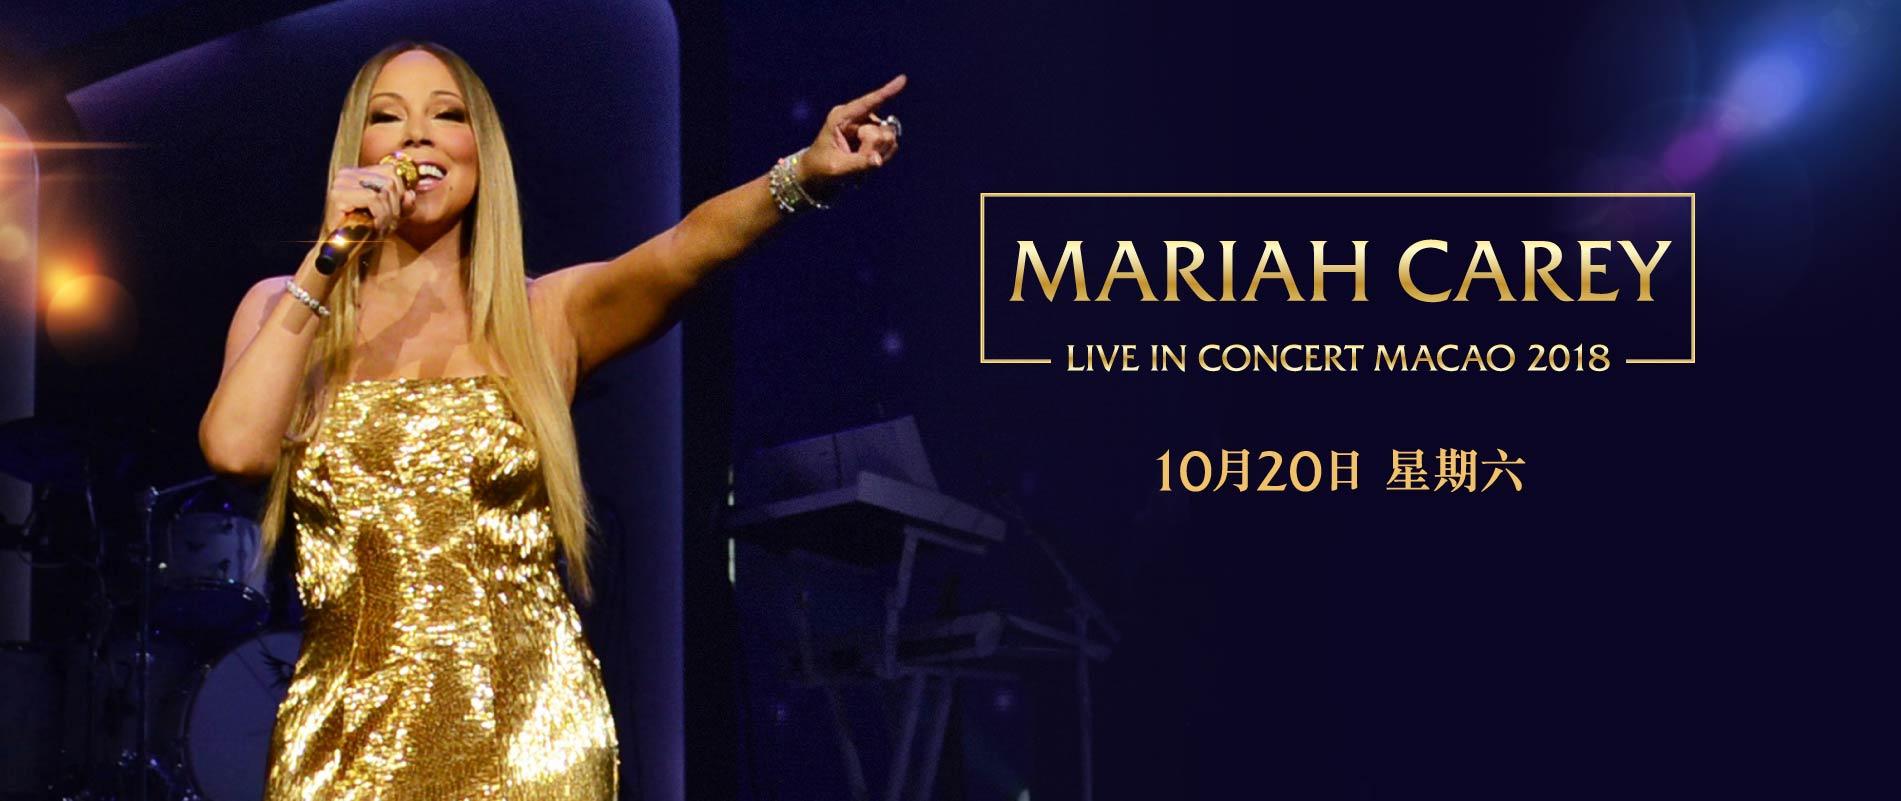 MARIAH CAREY LIVE IN CONCERT MACAO 2018 - 澳门威尼斯人金光综艺馆